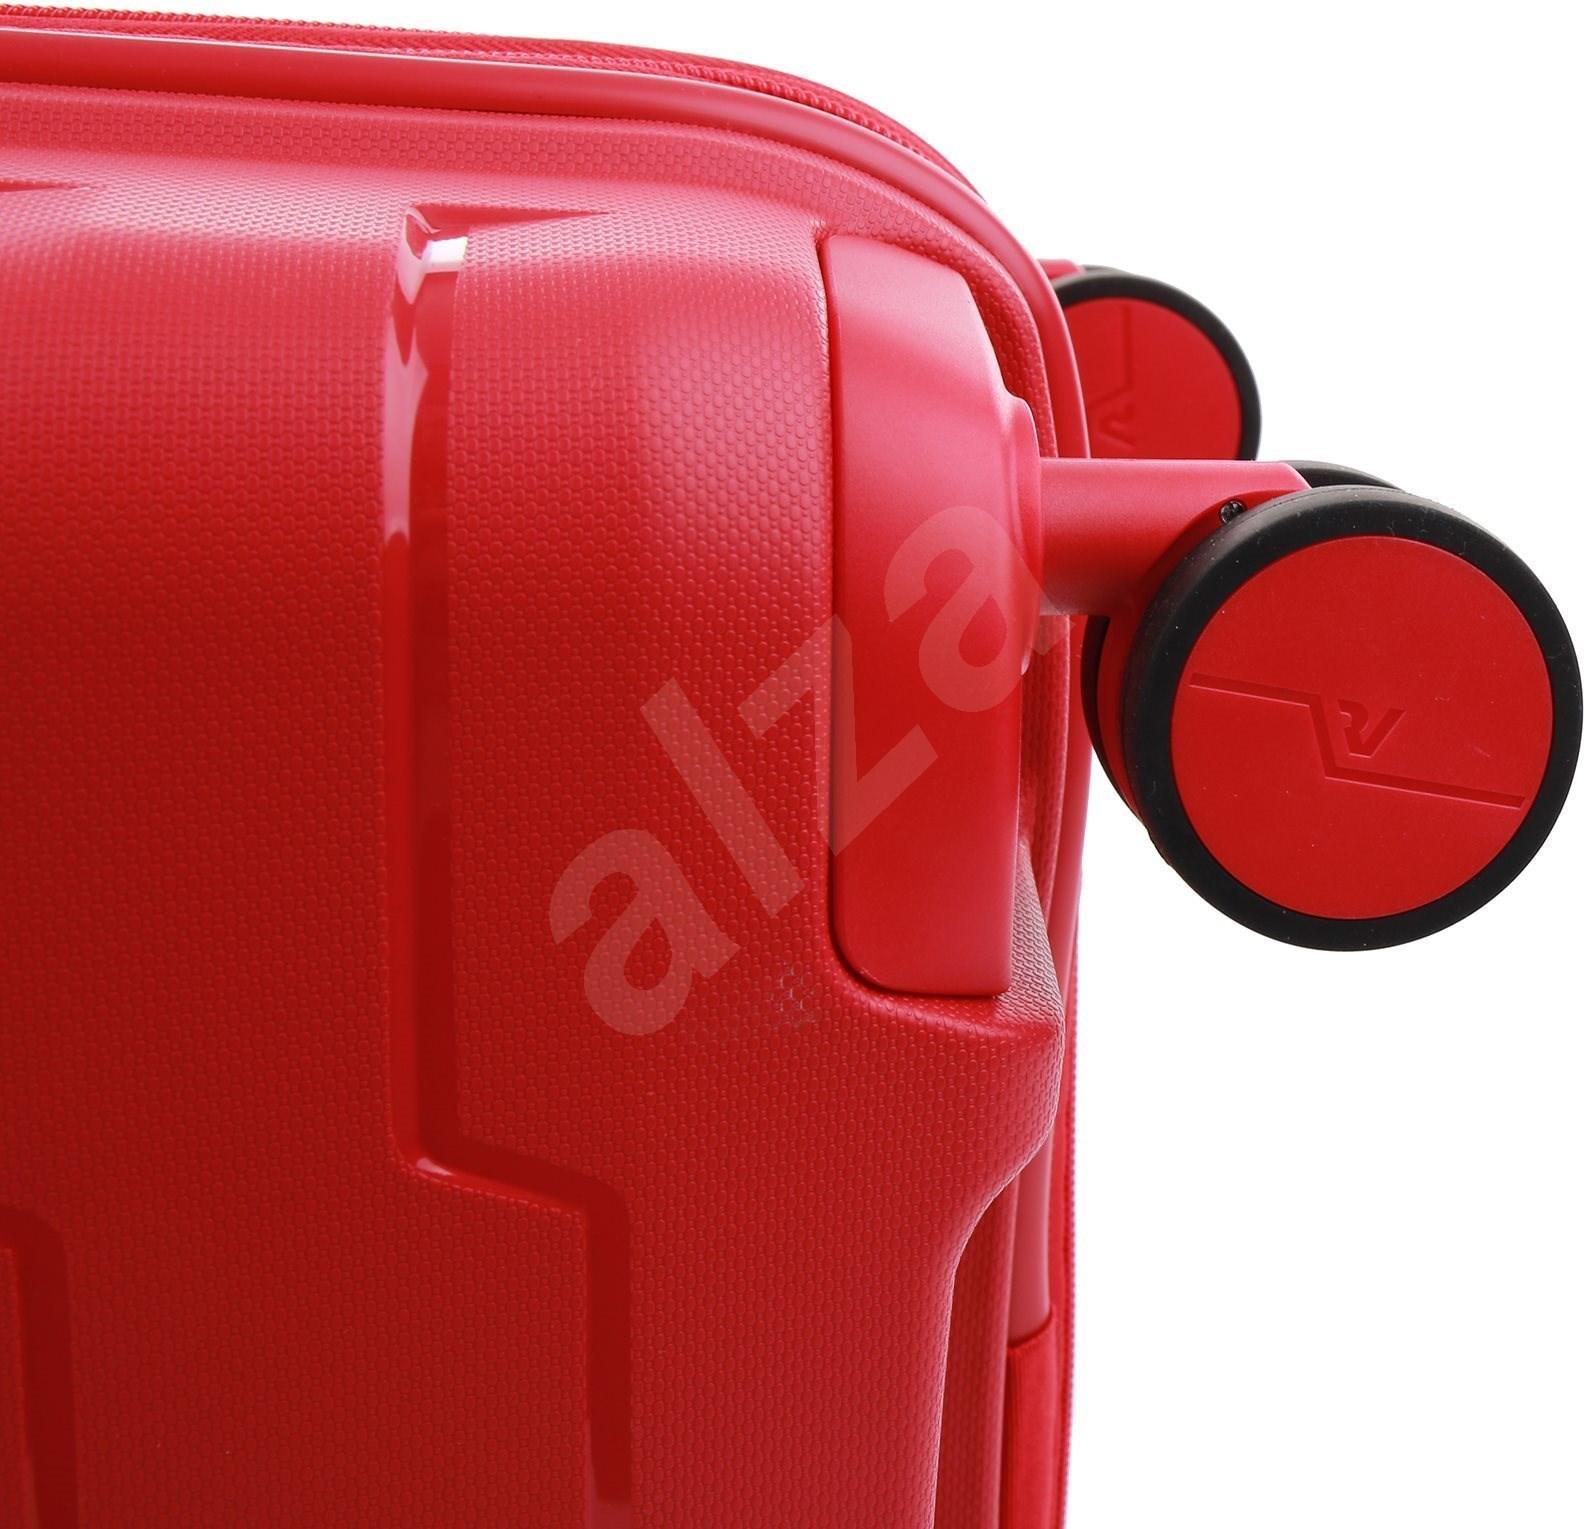 Roncato Skyline  55 cm  4 kerék  EXP piros - Bőrönd